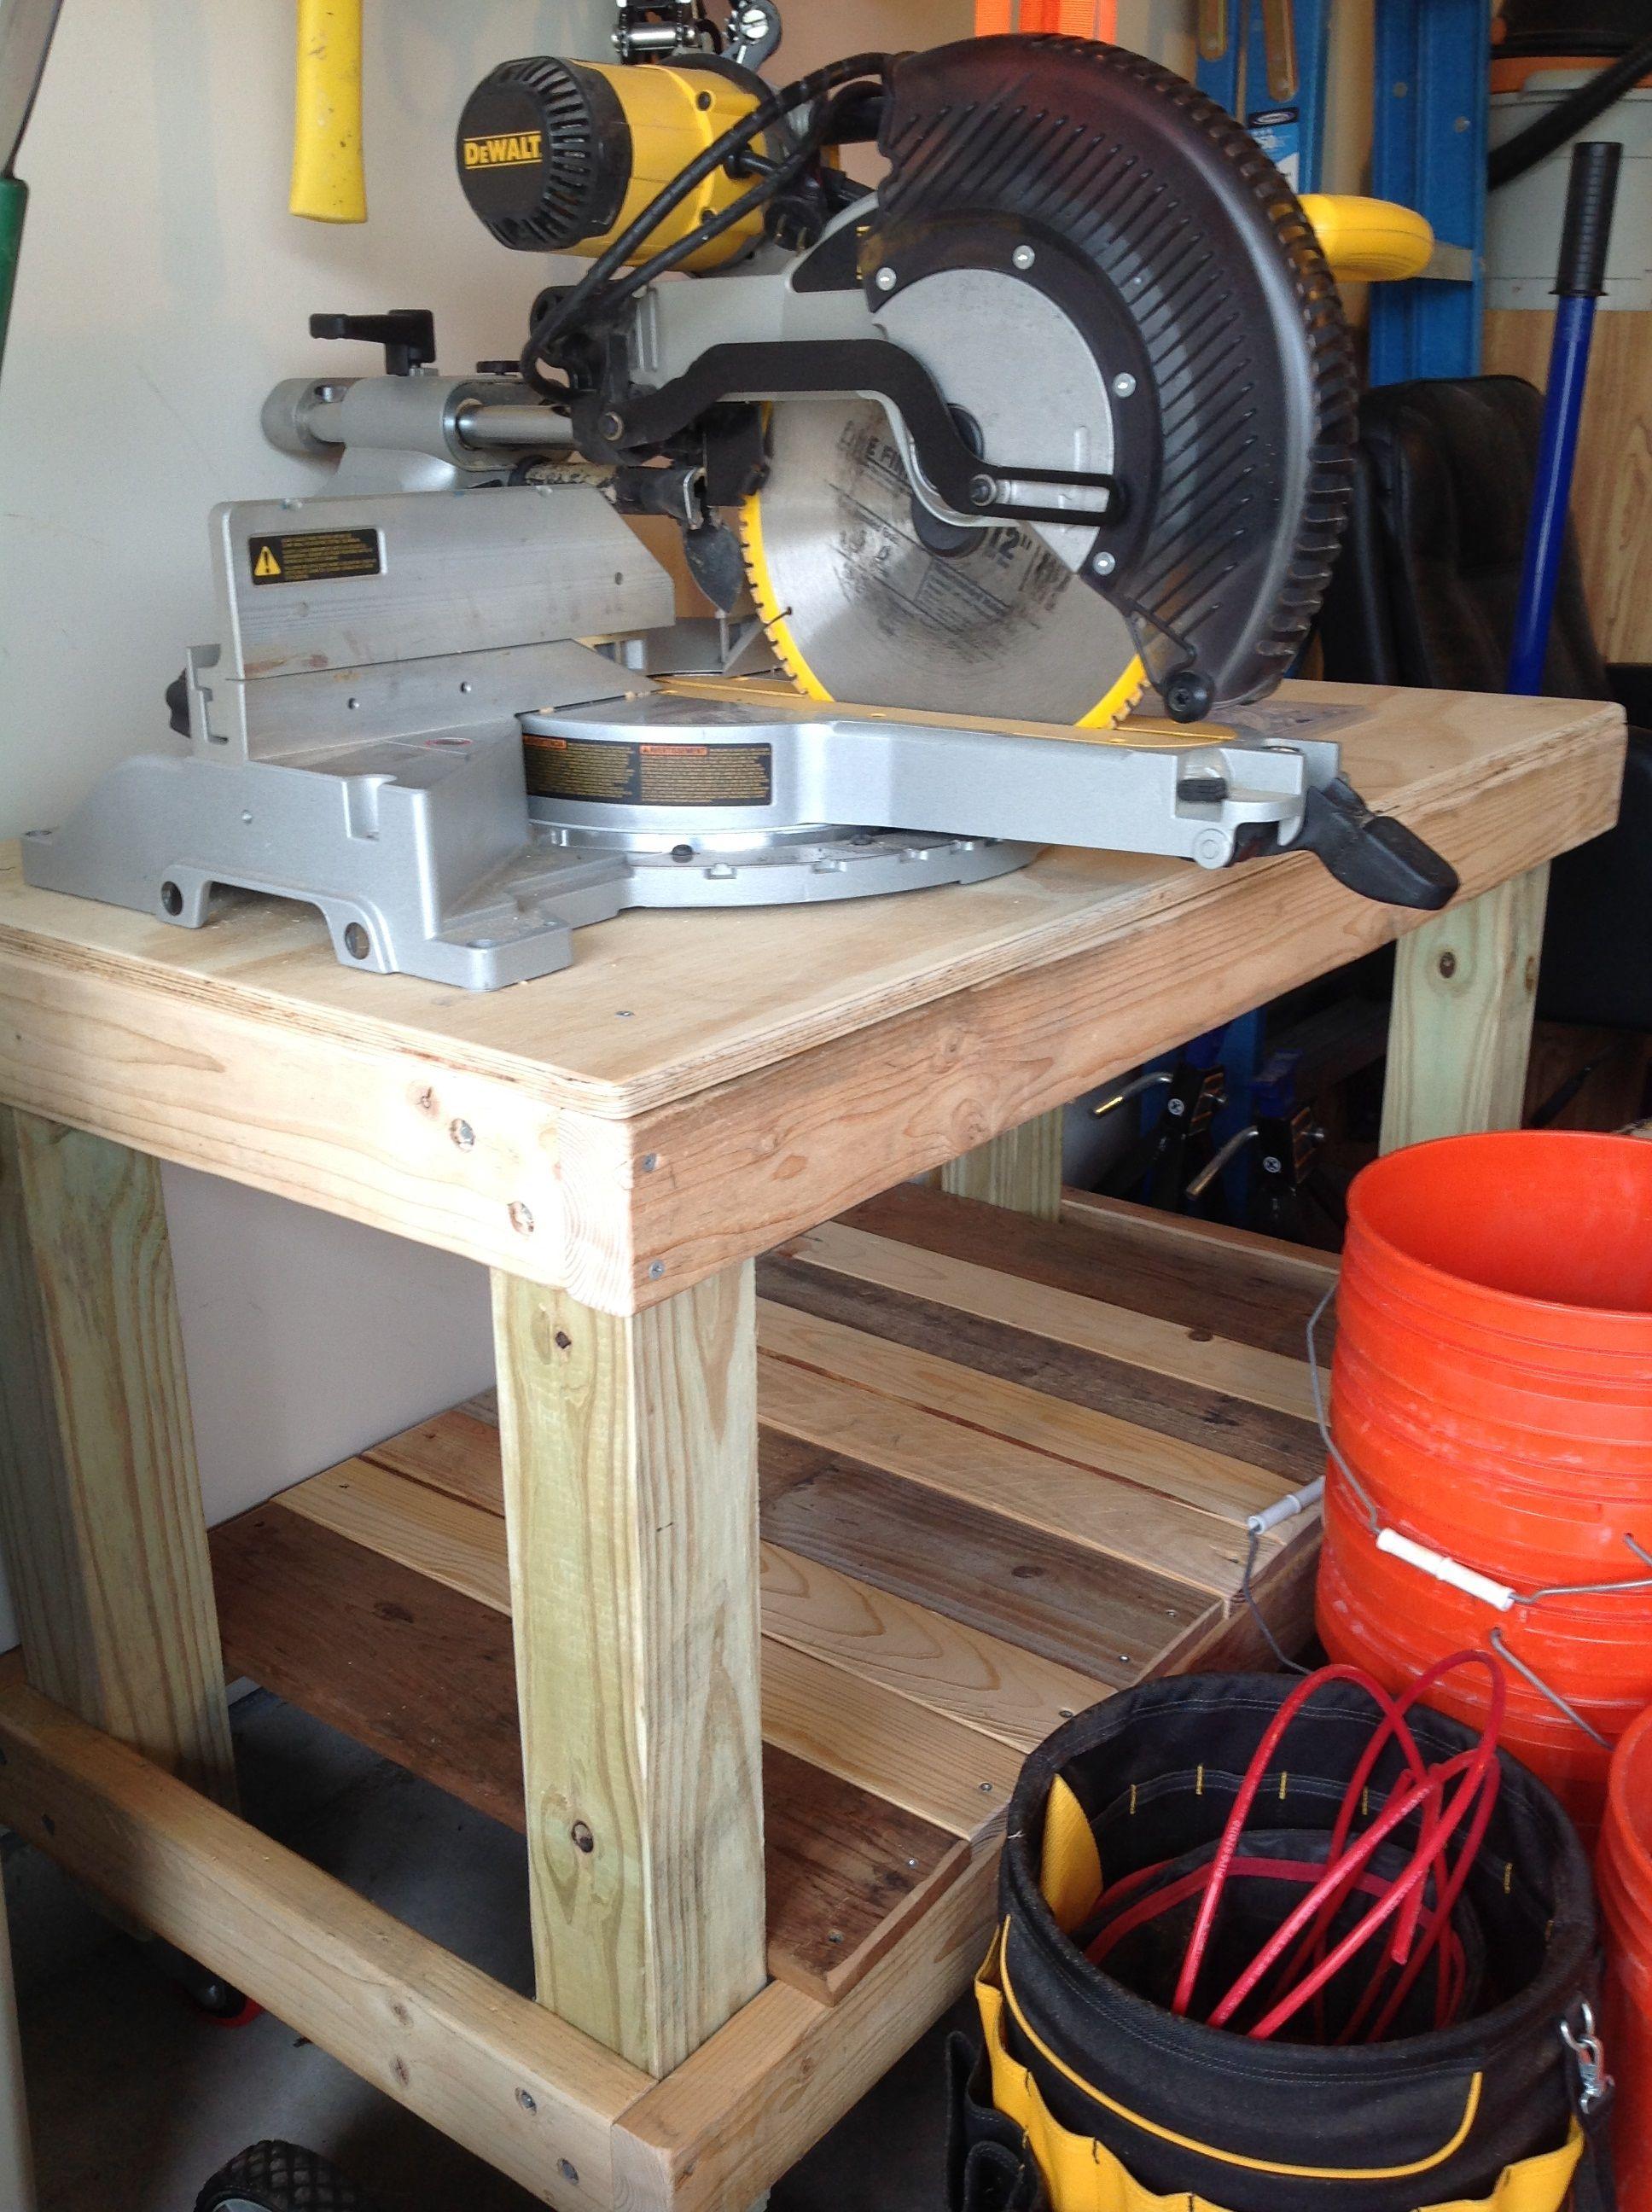 Diy Rolling Workbench - 4x4 Post Legs; 2x4 Frame; Pallet